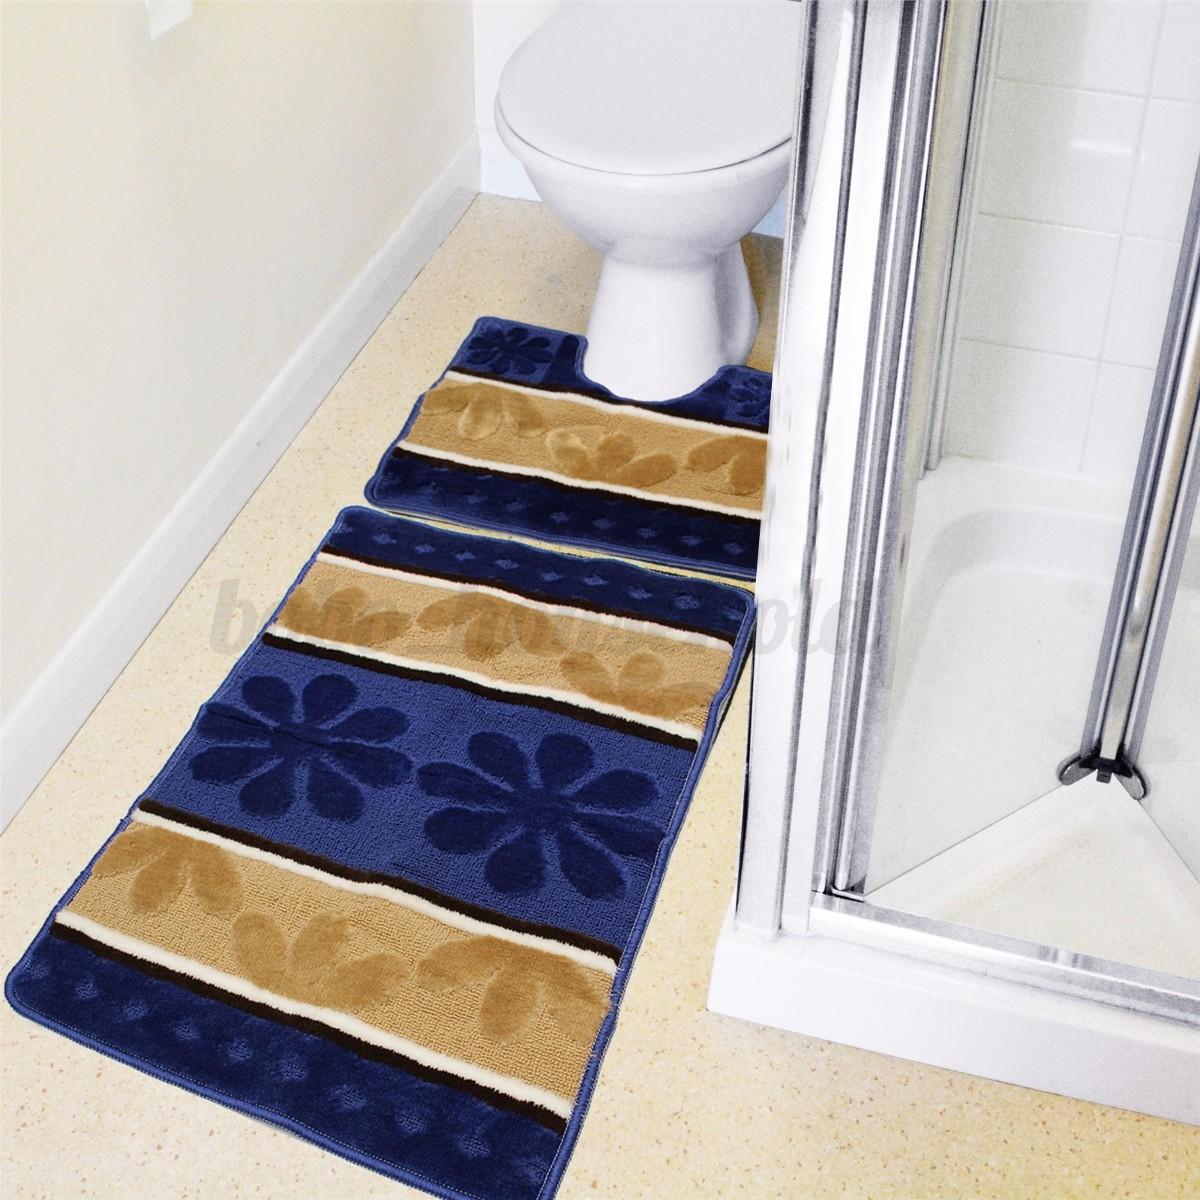 Washable Bathroom Carpet: 2 Piece Bathroom Mat Pedestal Set Bath Rug Toilet Non Slip